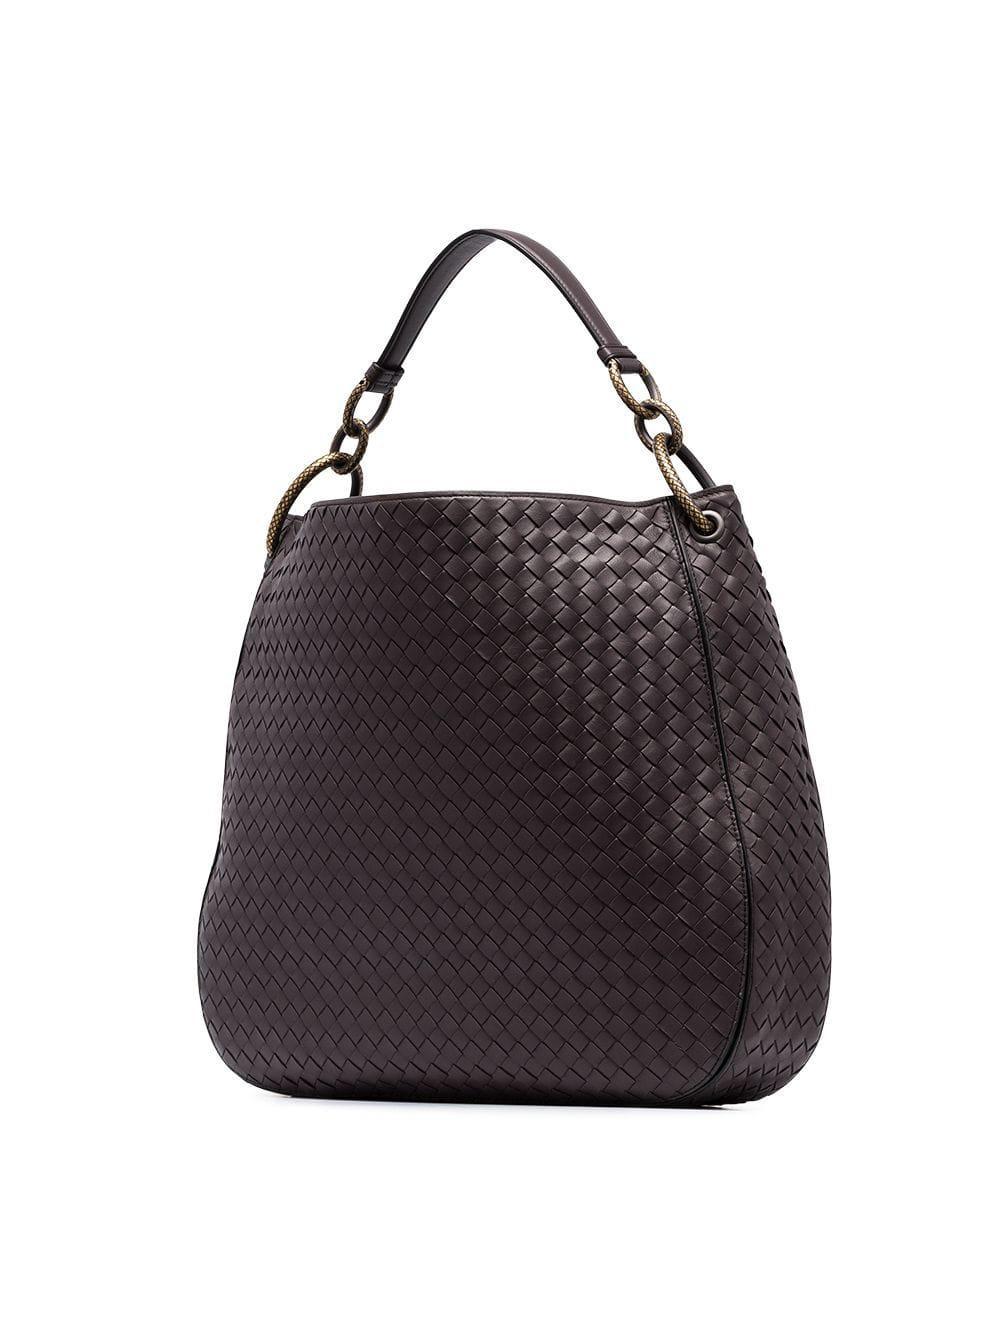 e32d2204d061 Bottega Veneta - Gray Graphite Loop Medium Leather Shoulder Bag - Lyst.  View fullscreen